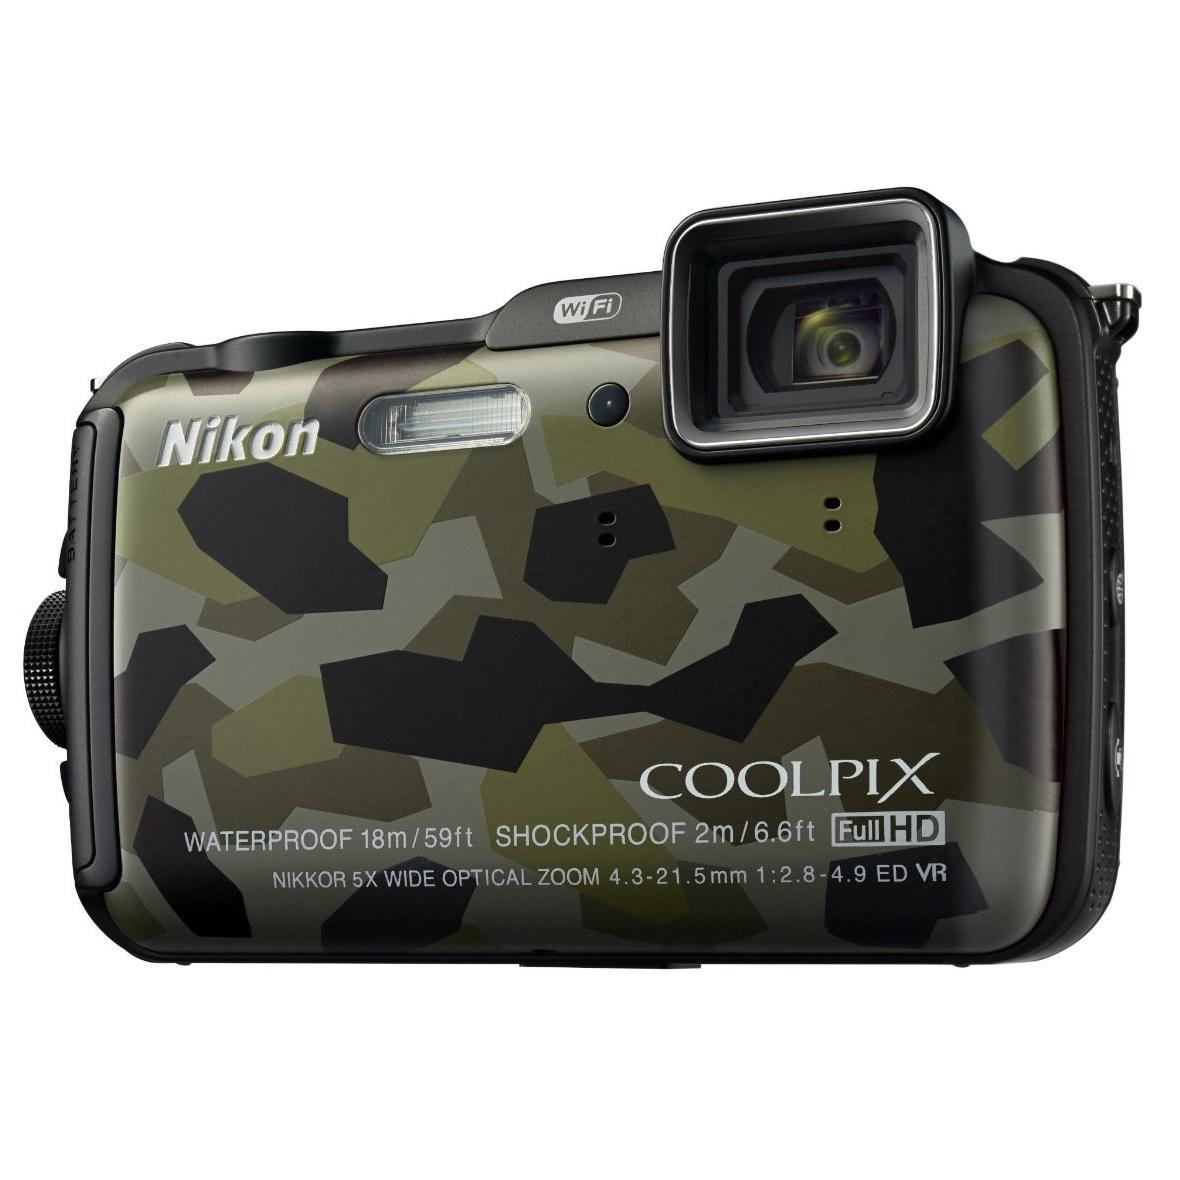 Nikon Coolpix AW120 Outdoor Digital Camera - Camouflage